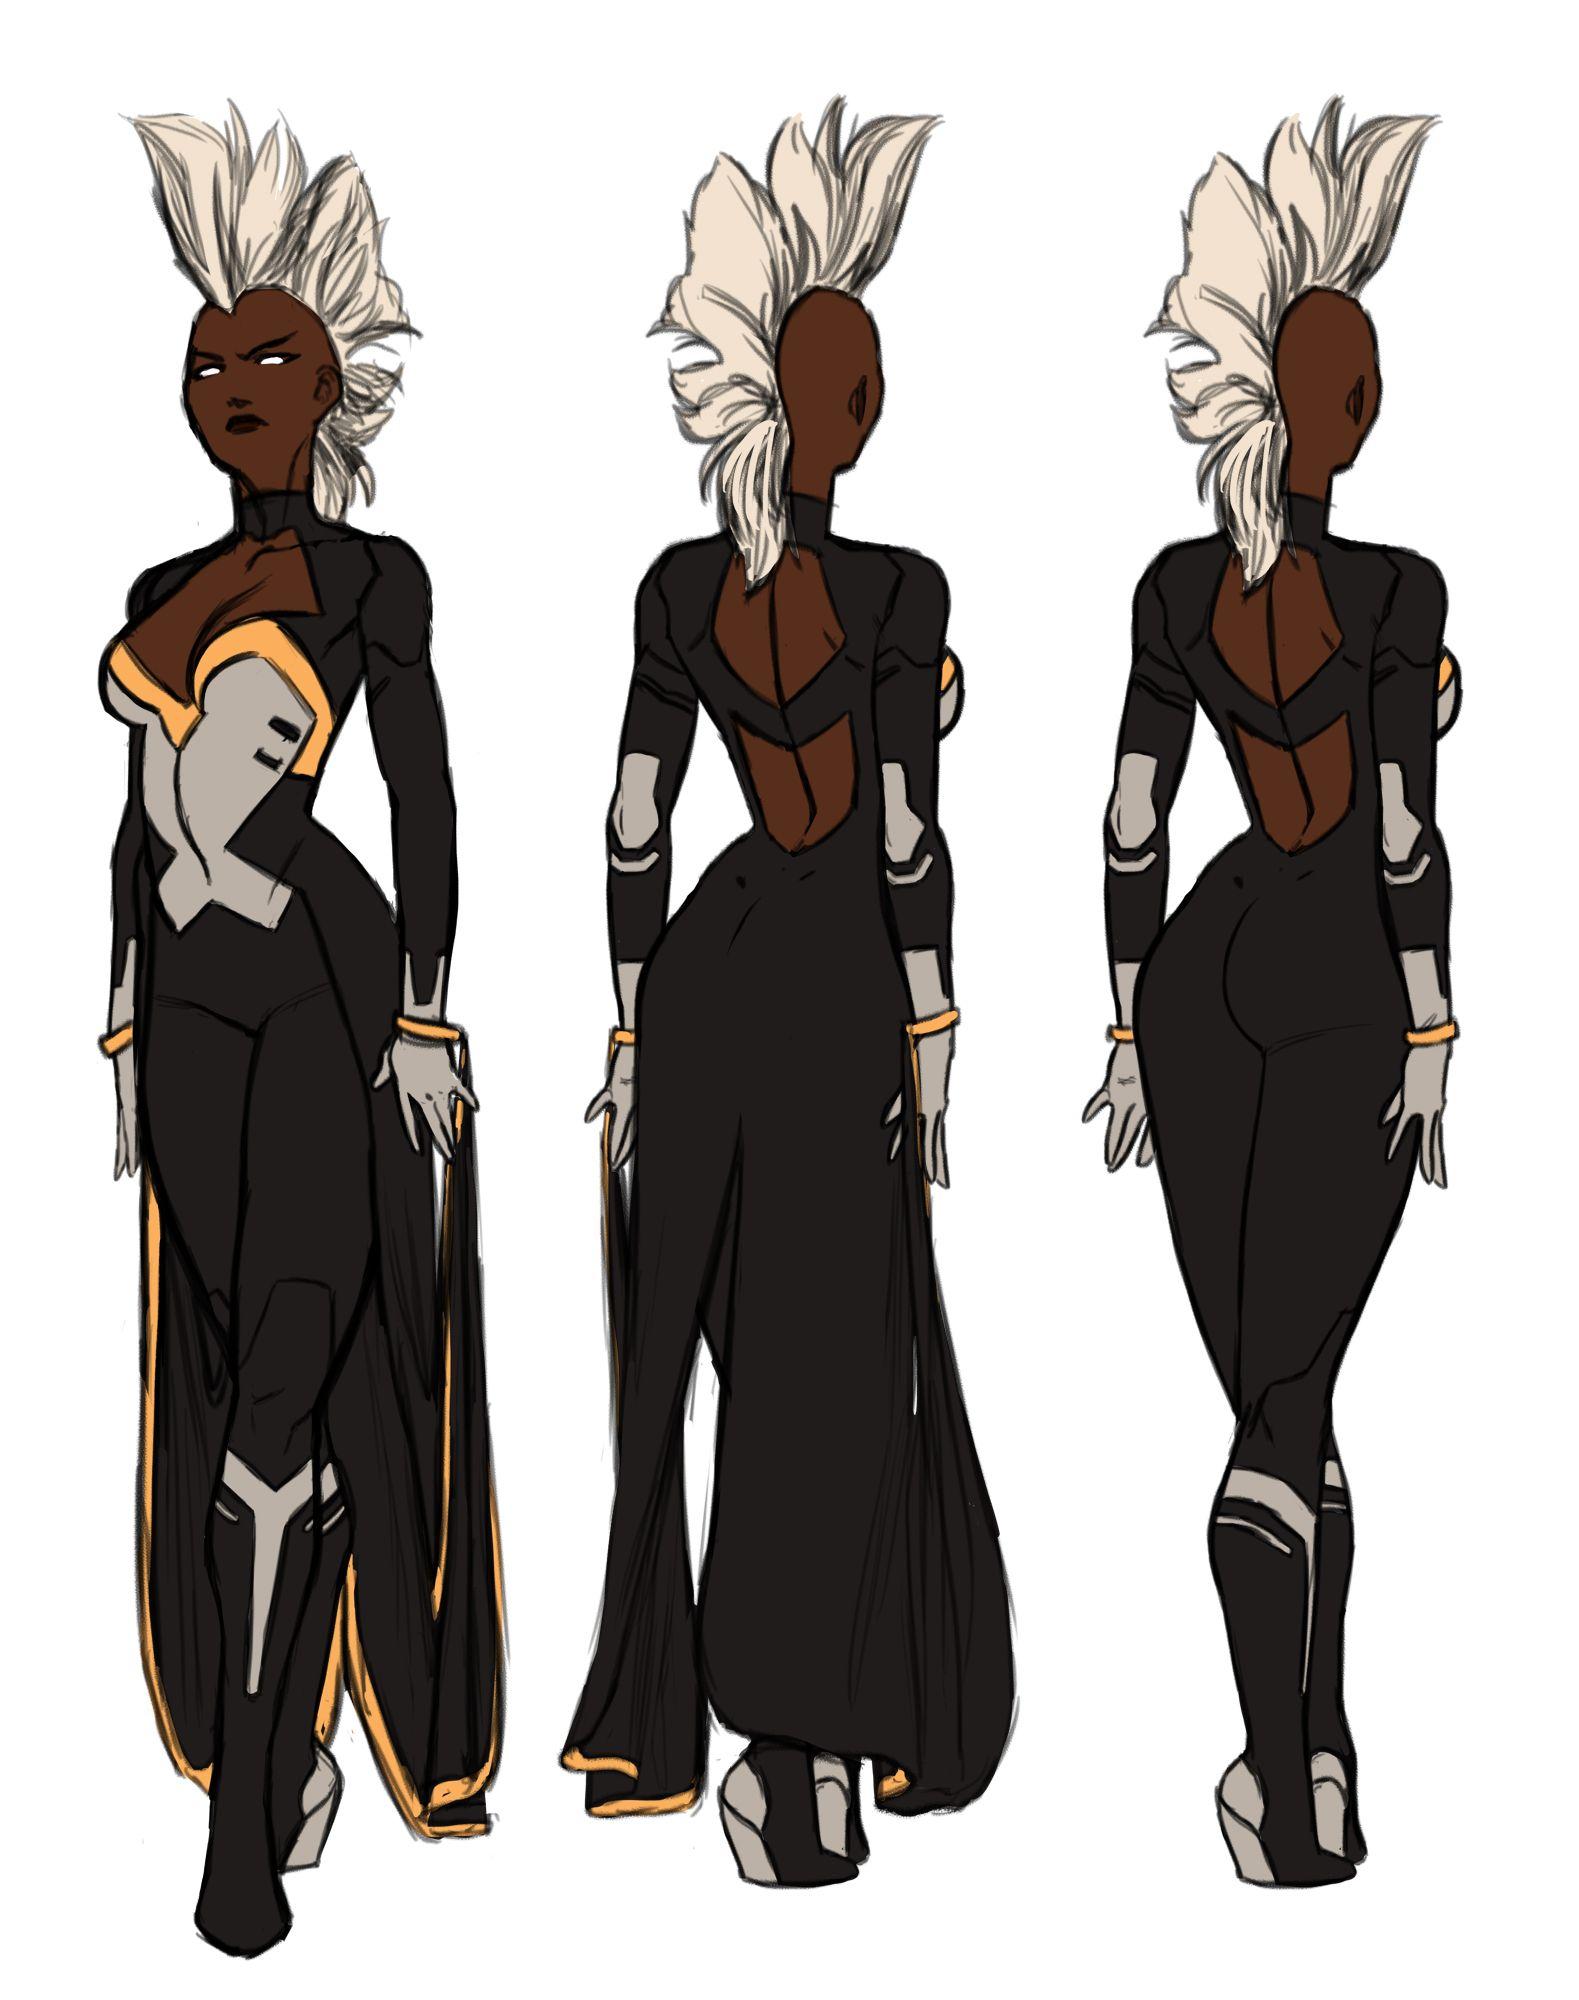 Uncanny X Force Vol 2 Storm By Kristafer Anka Character Design Superhero Comic Artist